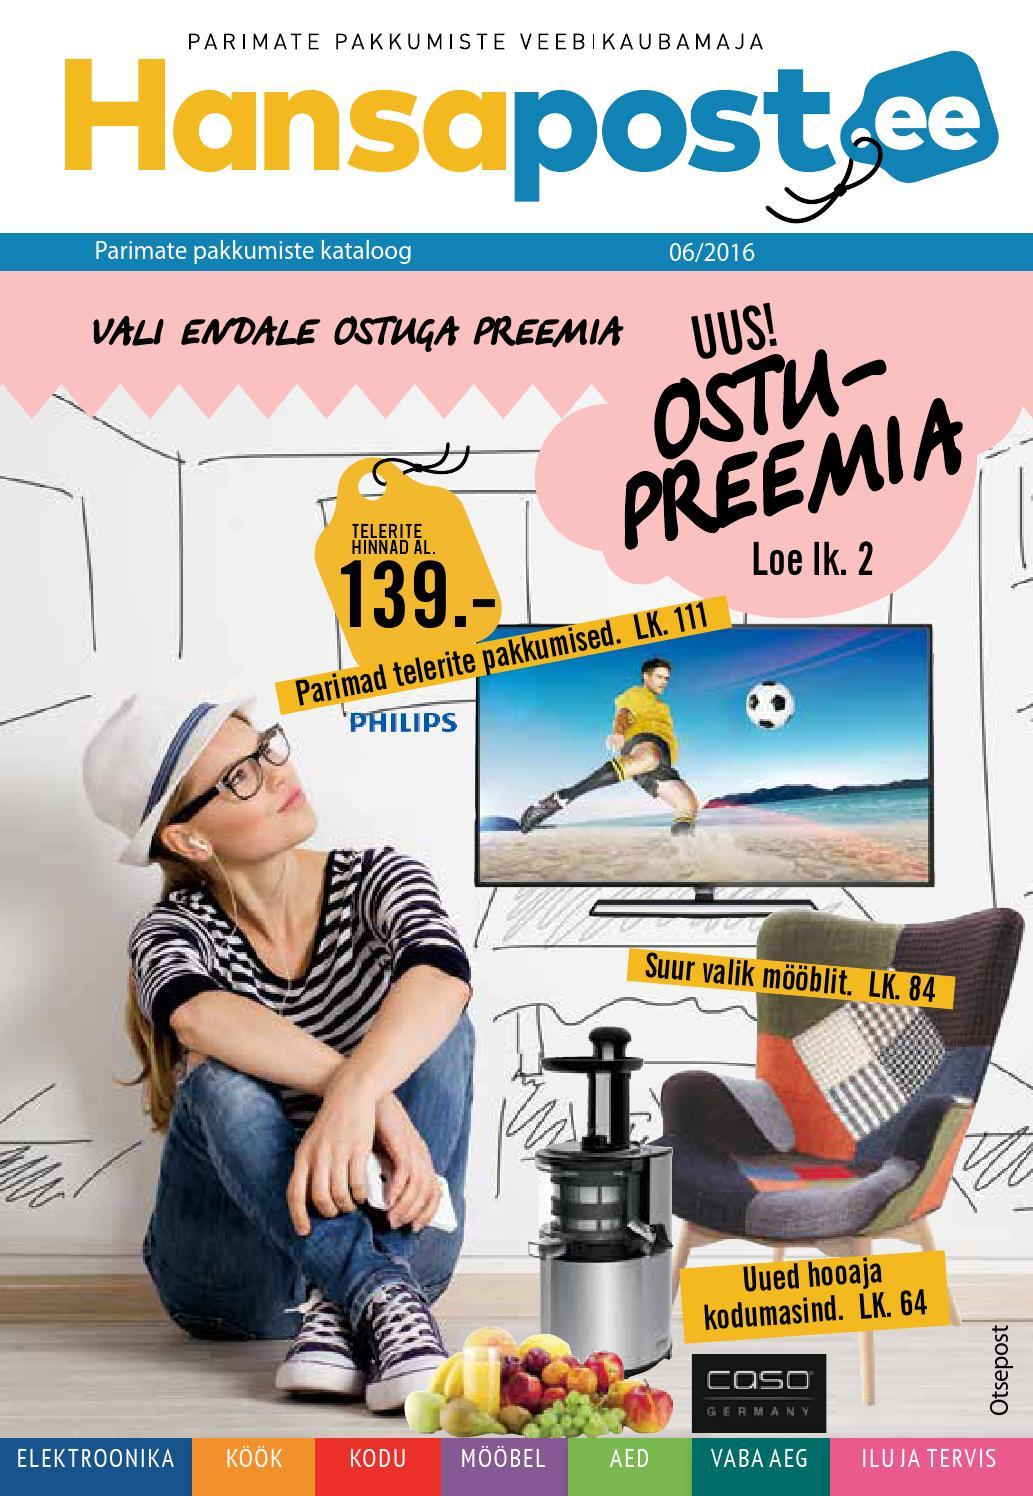 93517c8e38c Est 06 2016 web by Hansapost OY - issuu